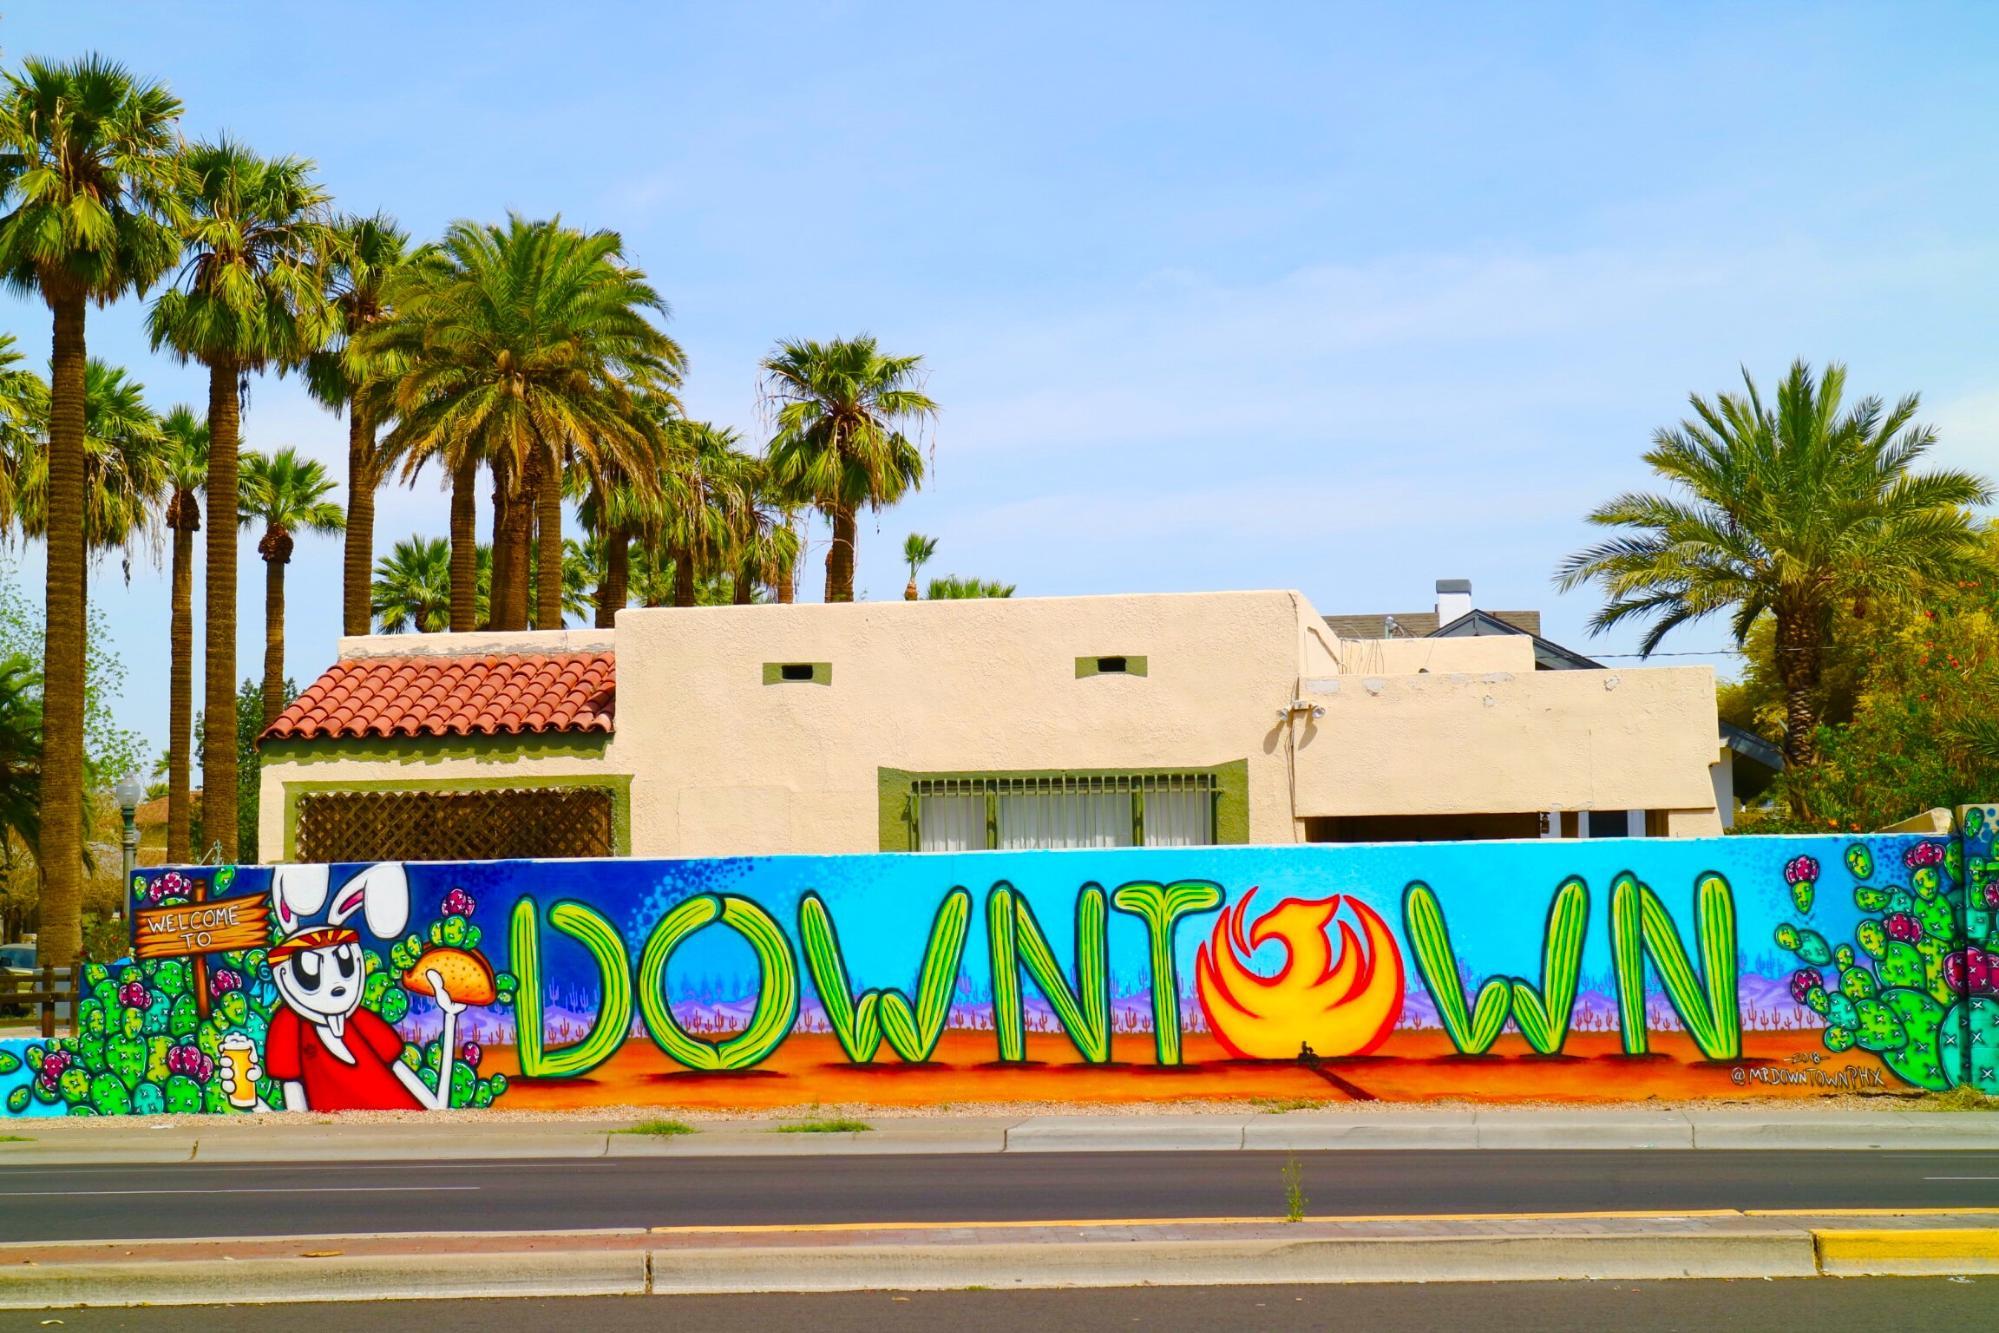 View of Downtown Phoenix, Arizona